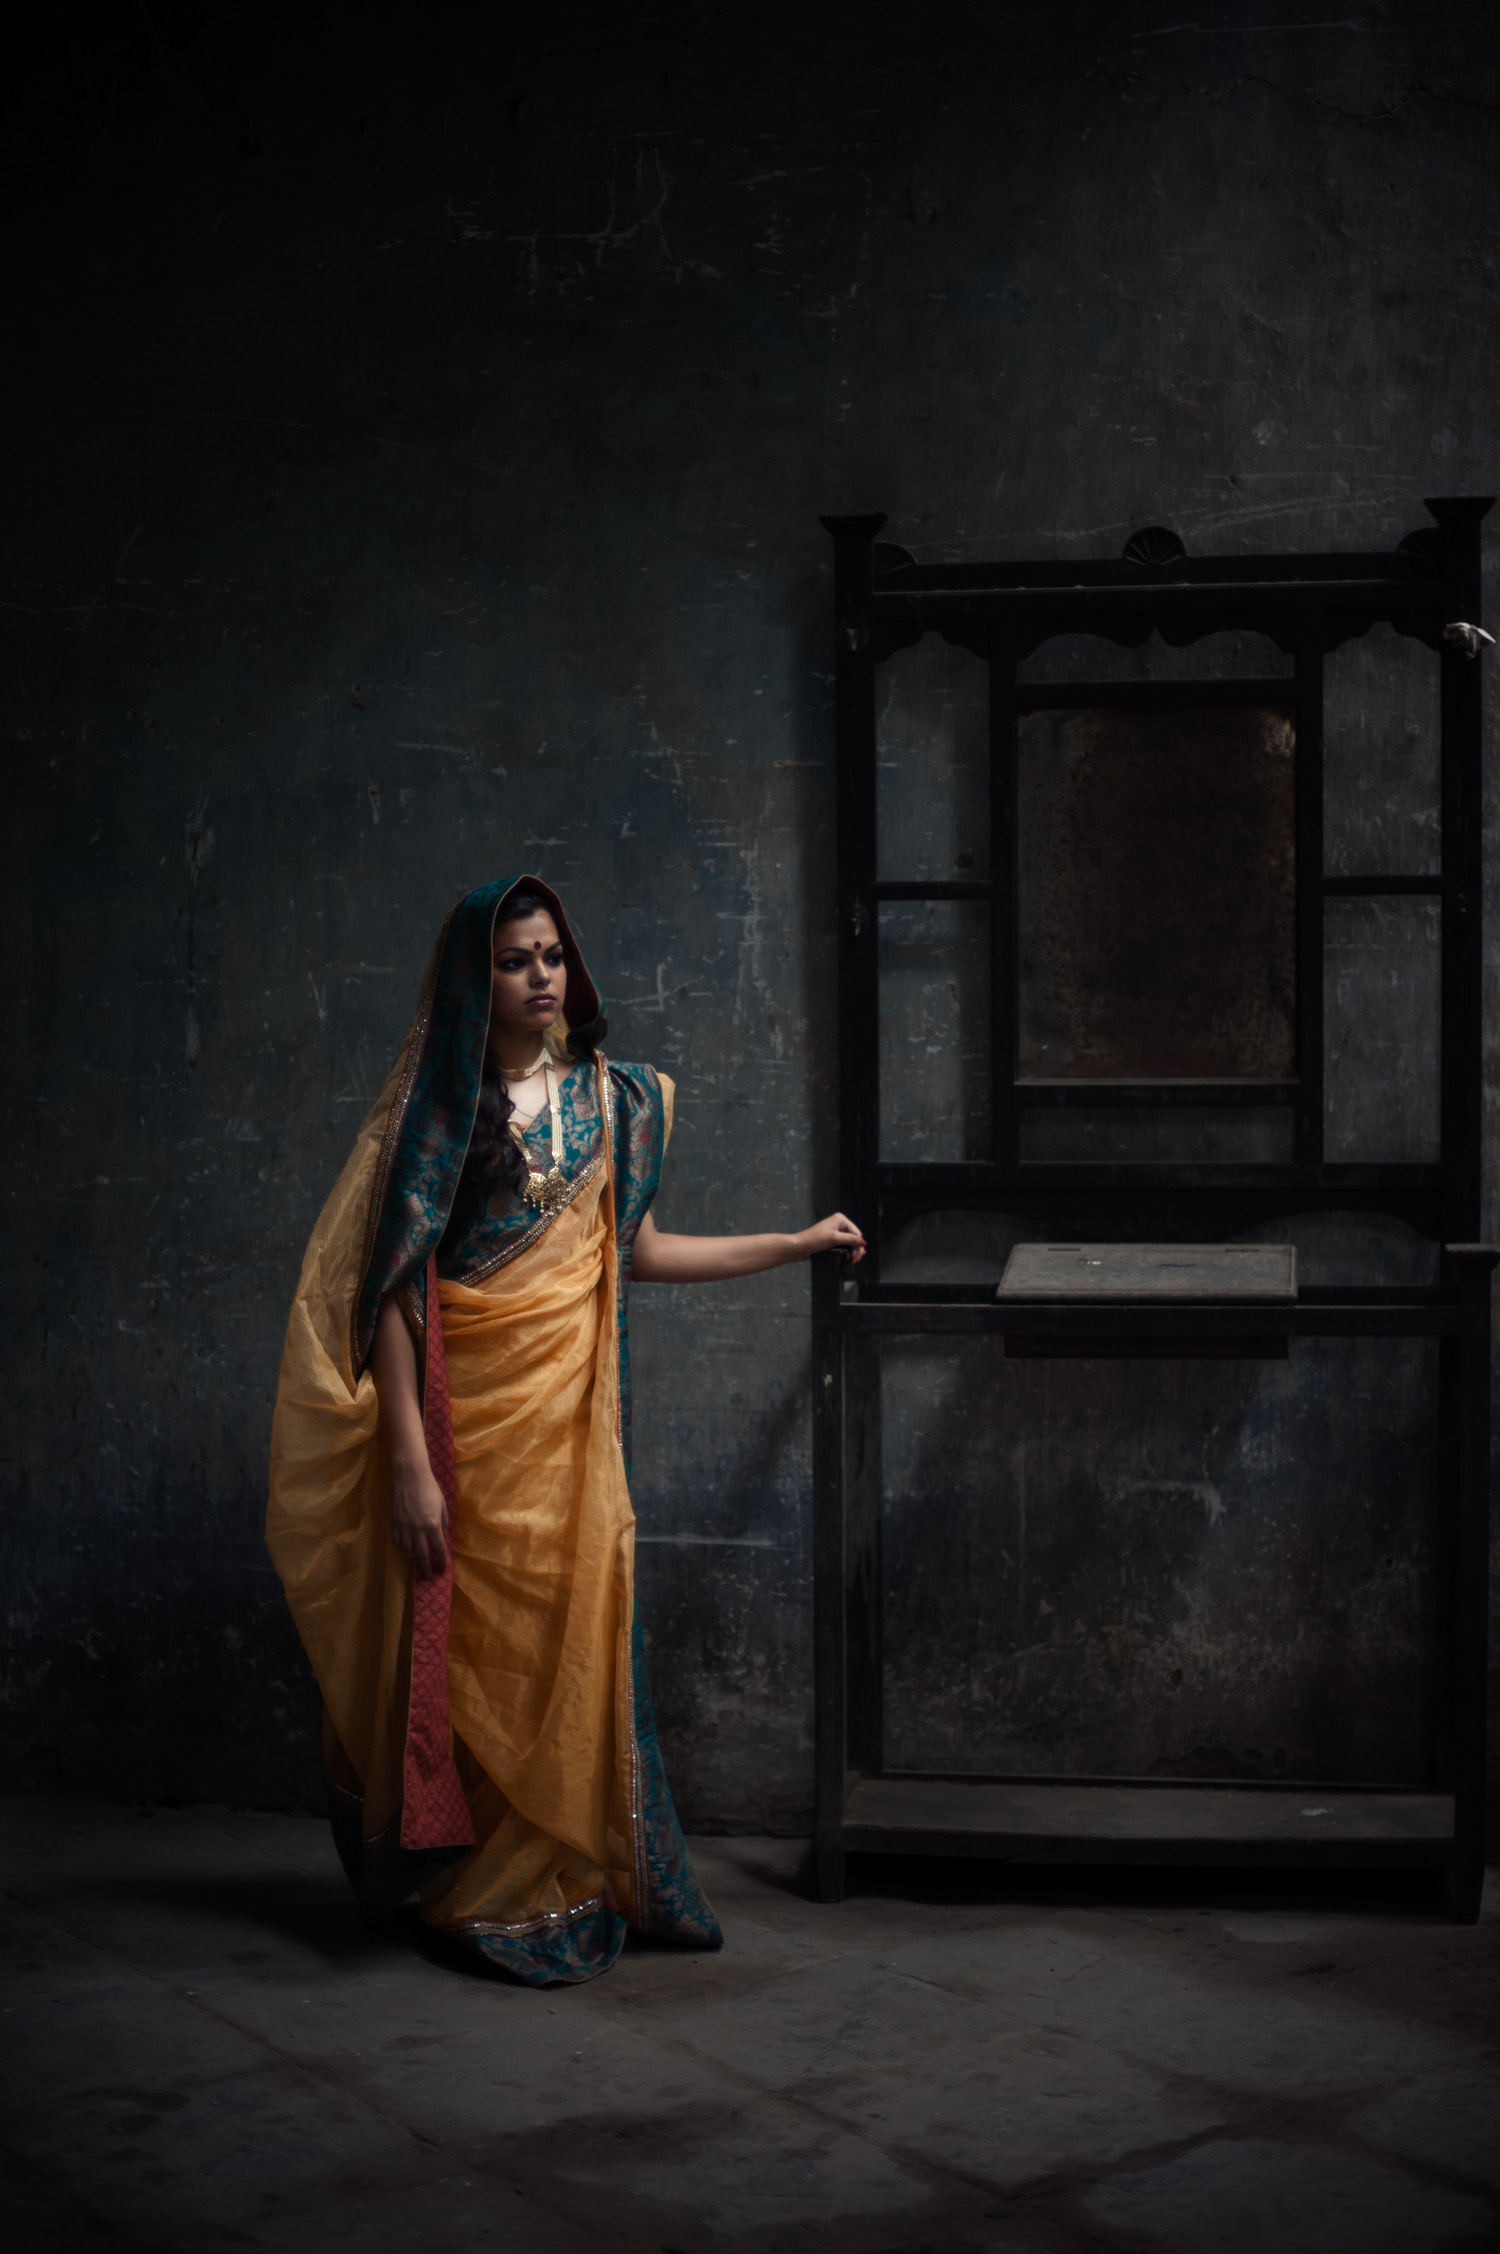 14_Chhandak Pradhan-fashion-Ruins and a Requiem-vintage_feudal_Indian_royal_portrait.jpg